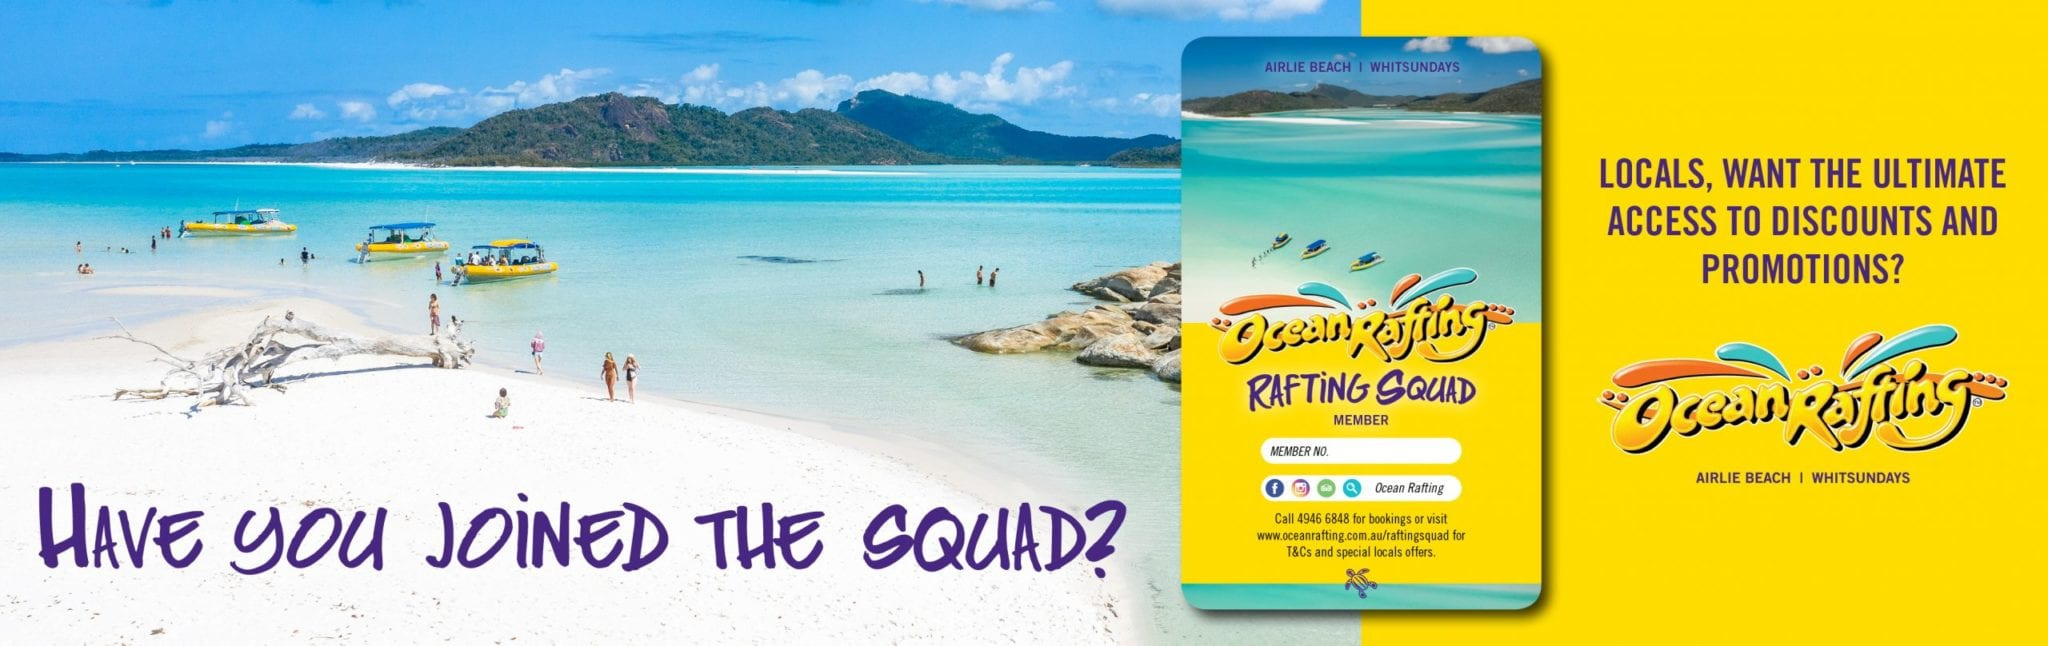 rafting squad